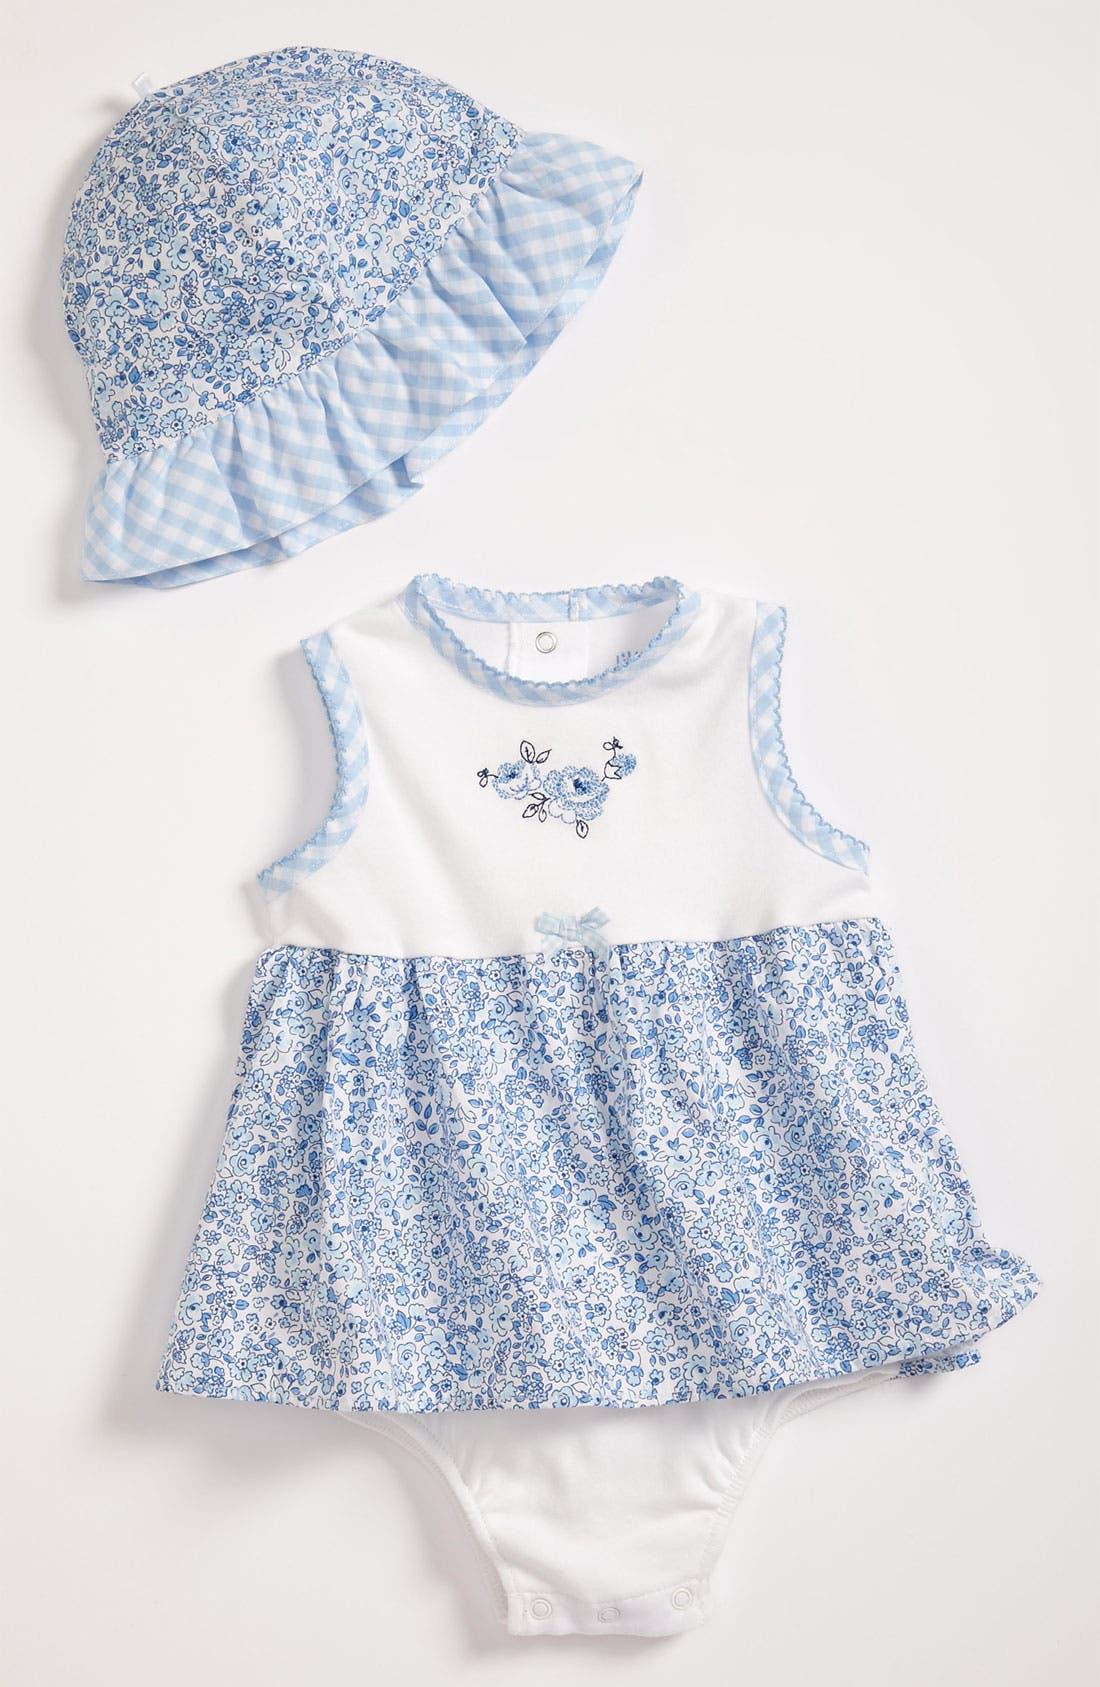 Alternate Image 1 Selected - Little Me 'Blue Belle' Bodysuit & Hat (Infant)